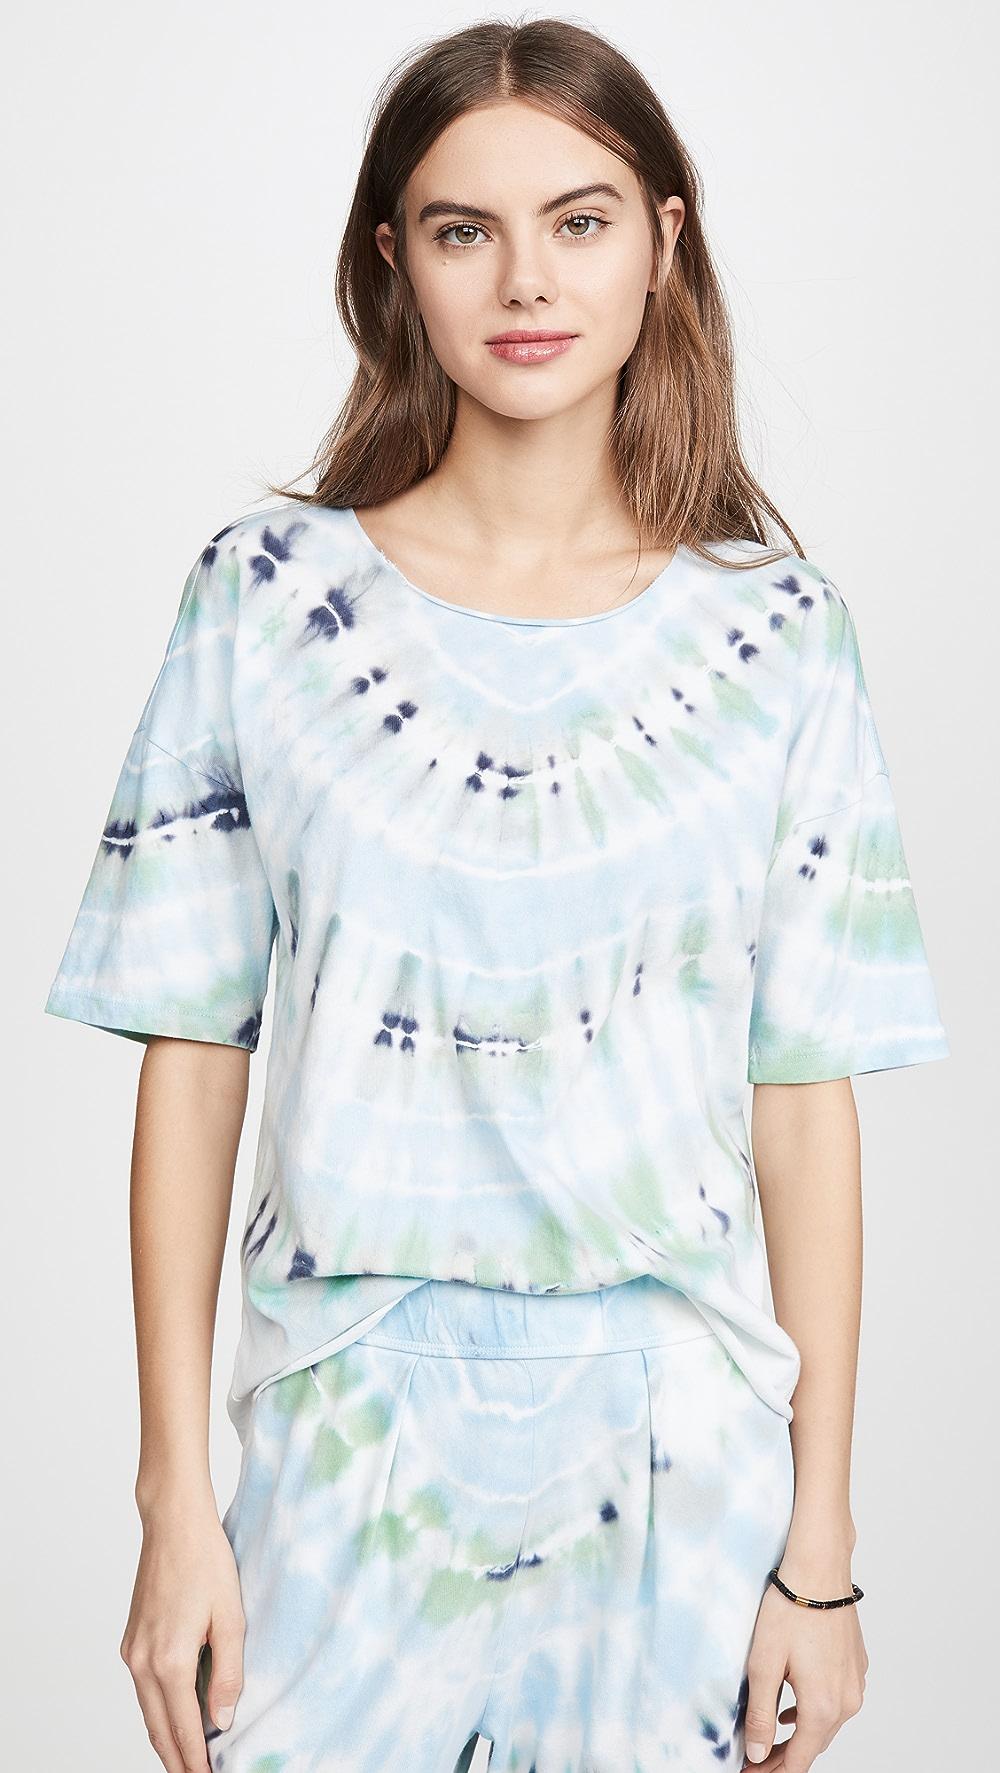 Audacious Raquel Allegra - Basic Tie Dye Tee Special Buy